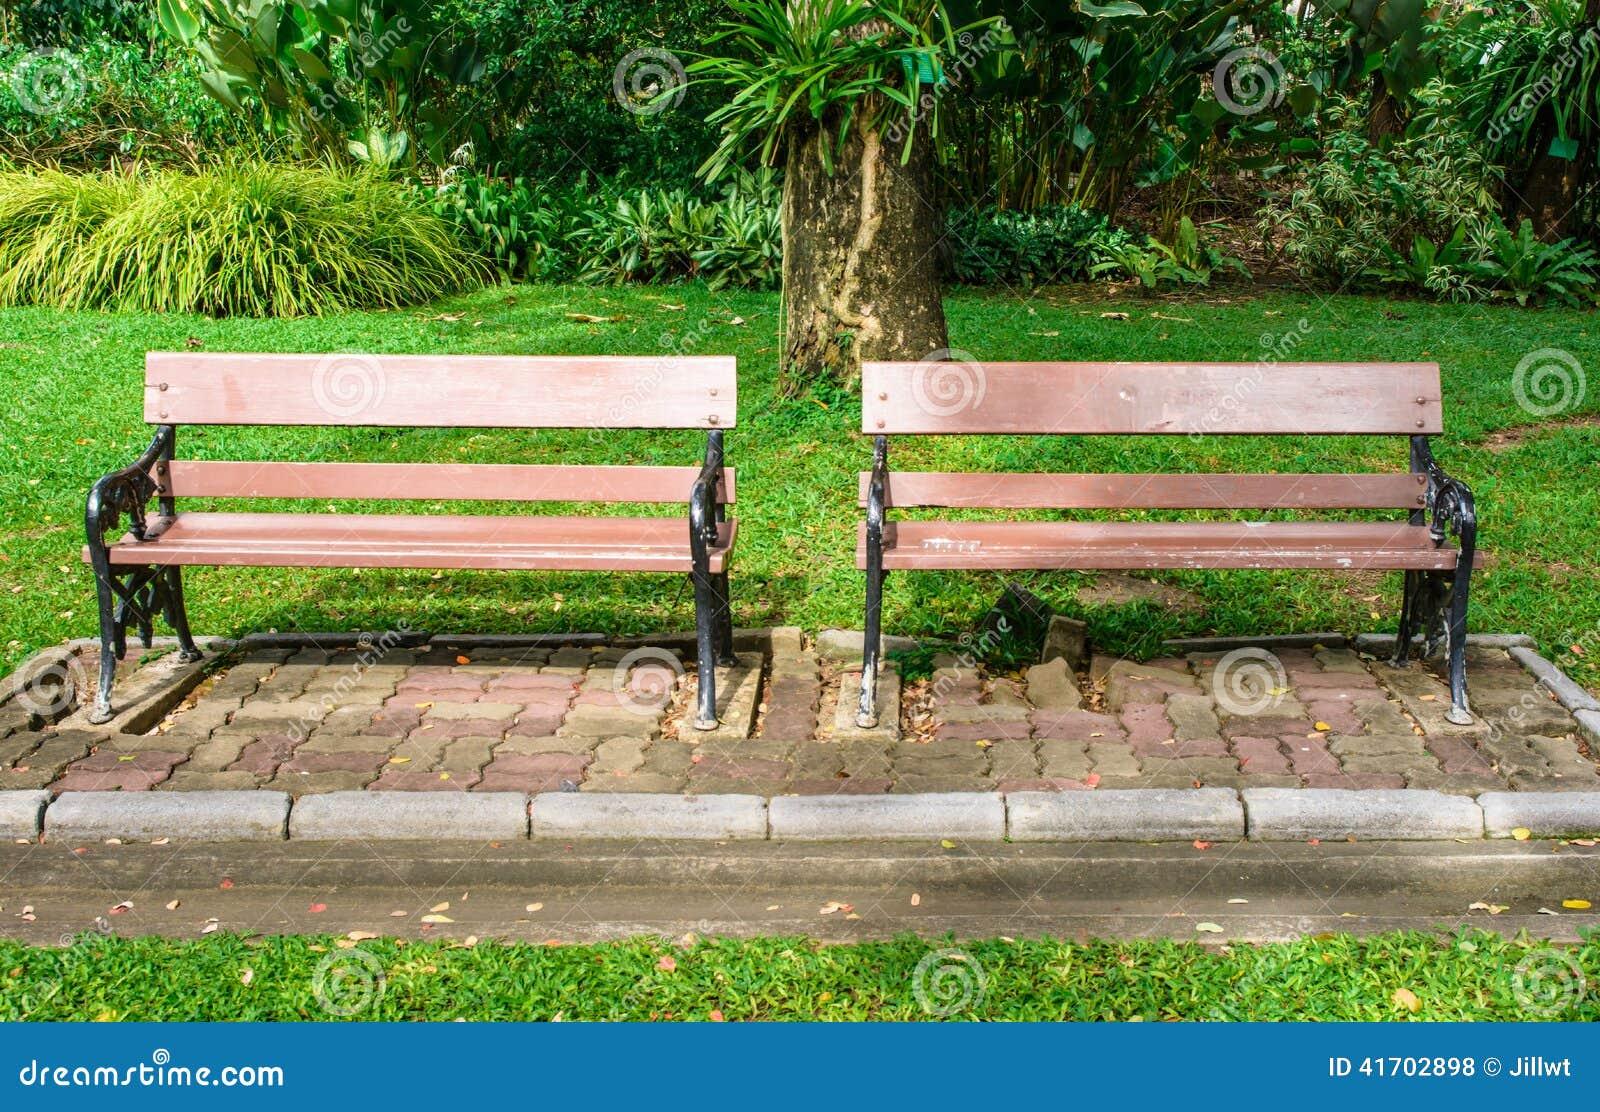 Park Bench Green Paint